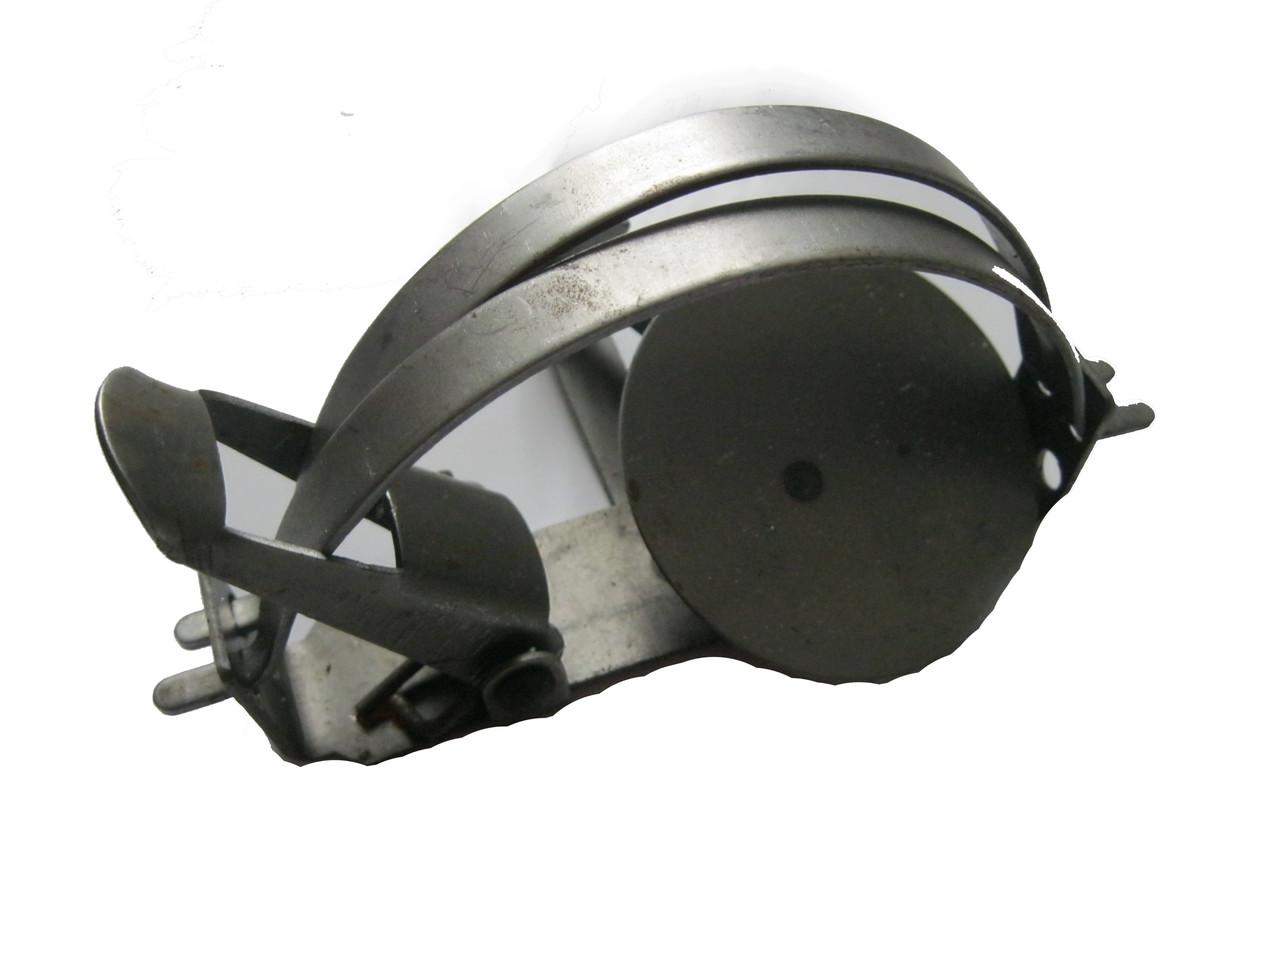 Мышеловка металлическая капкан